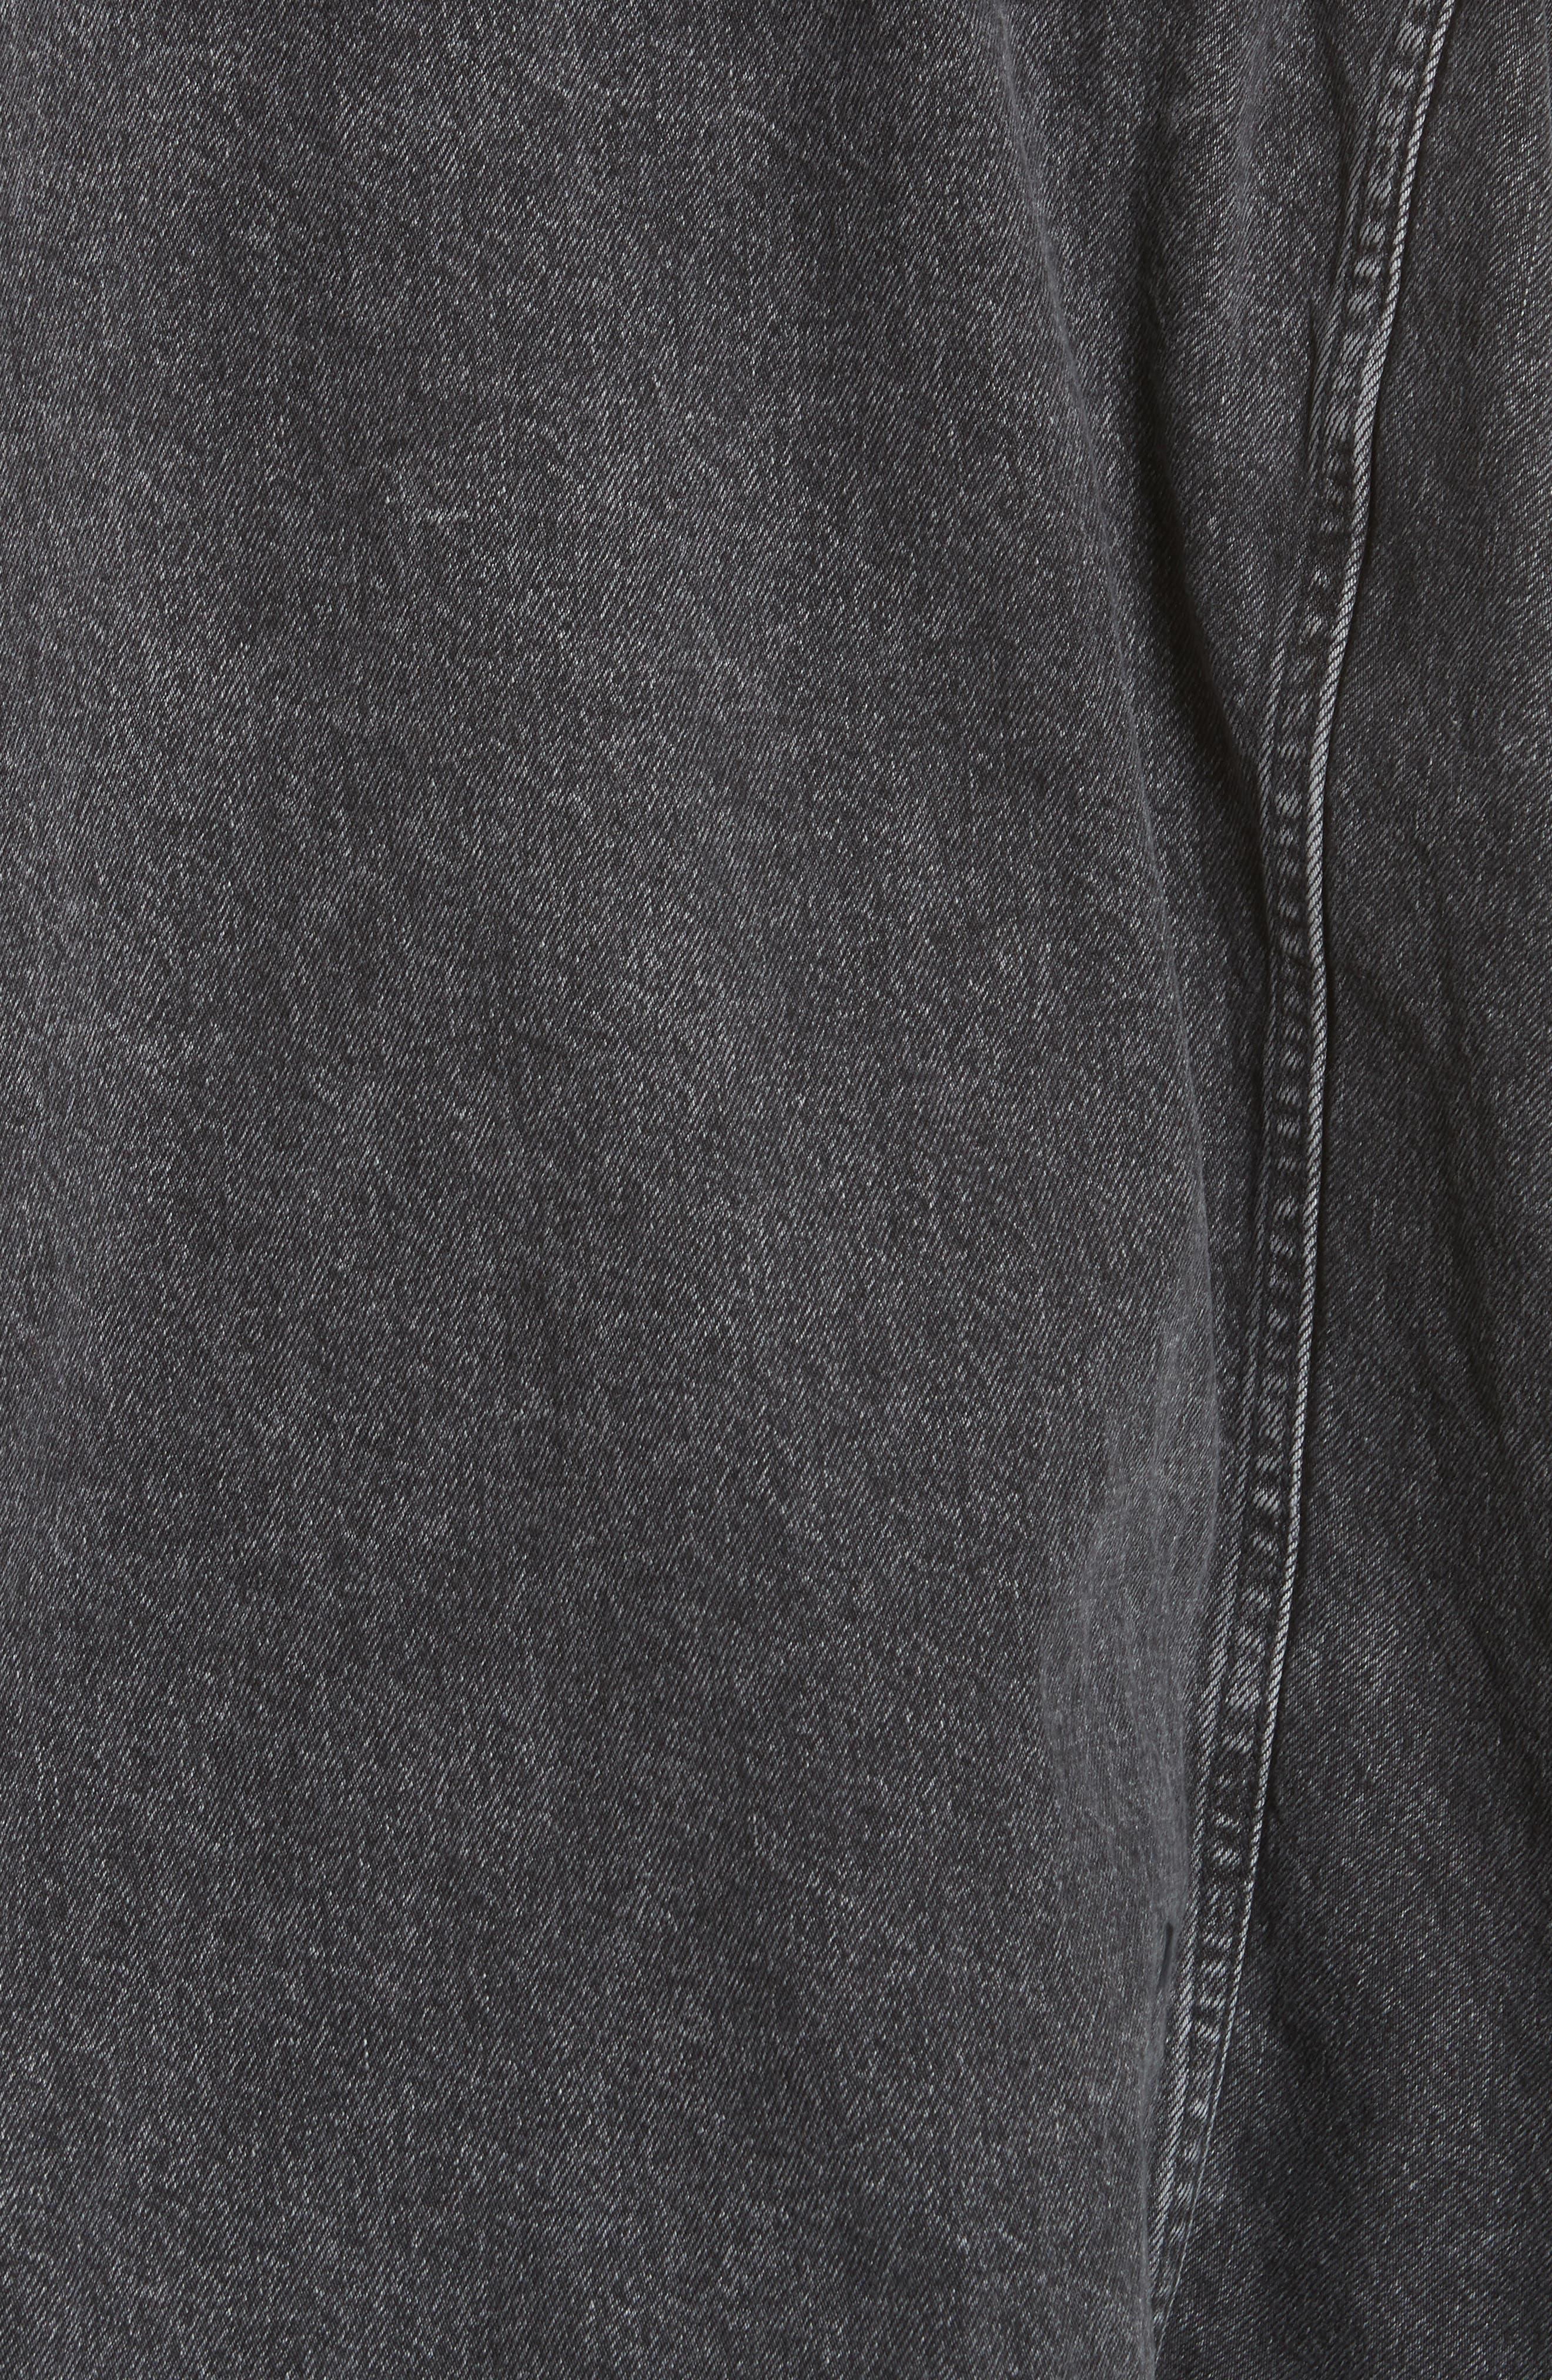 Oversized Removable Hood Denim Jacket,                             Alternate thumbnail 6, color,                             Black